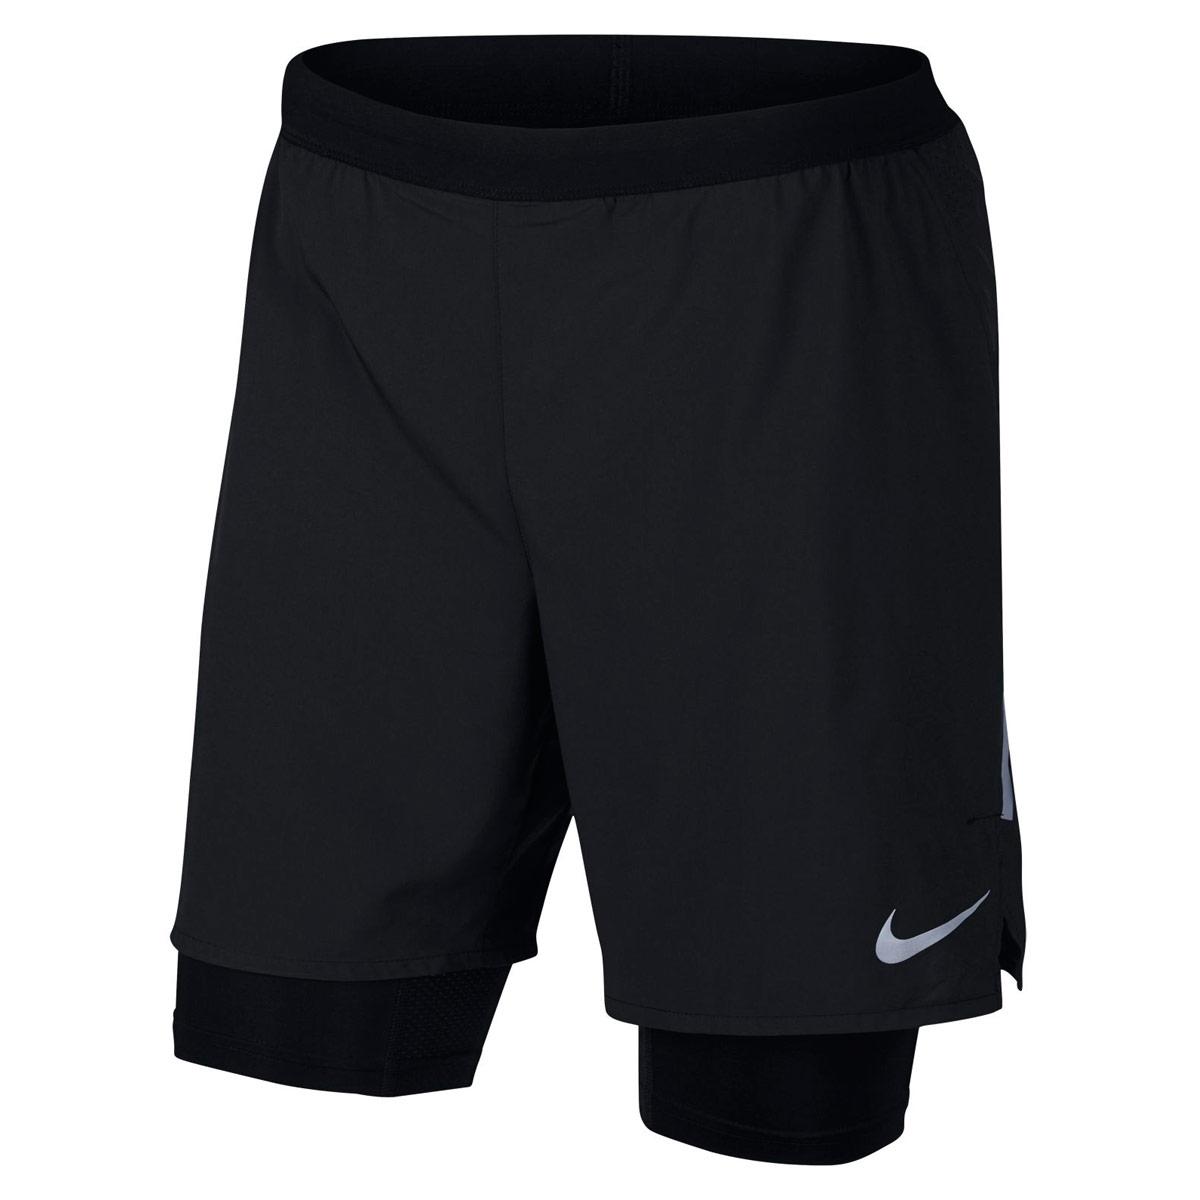 Nike Distance 2 in 1 7'' Shorts Herren